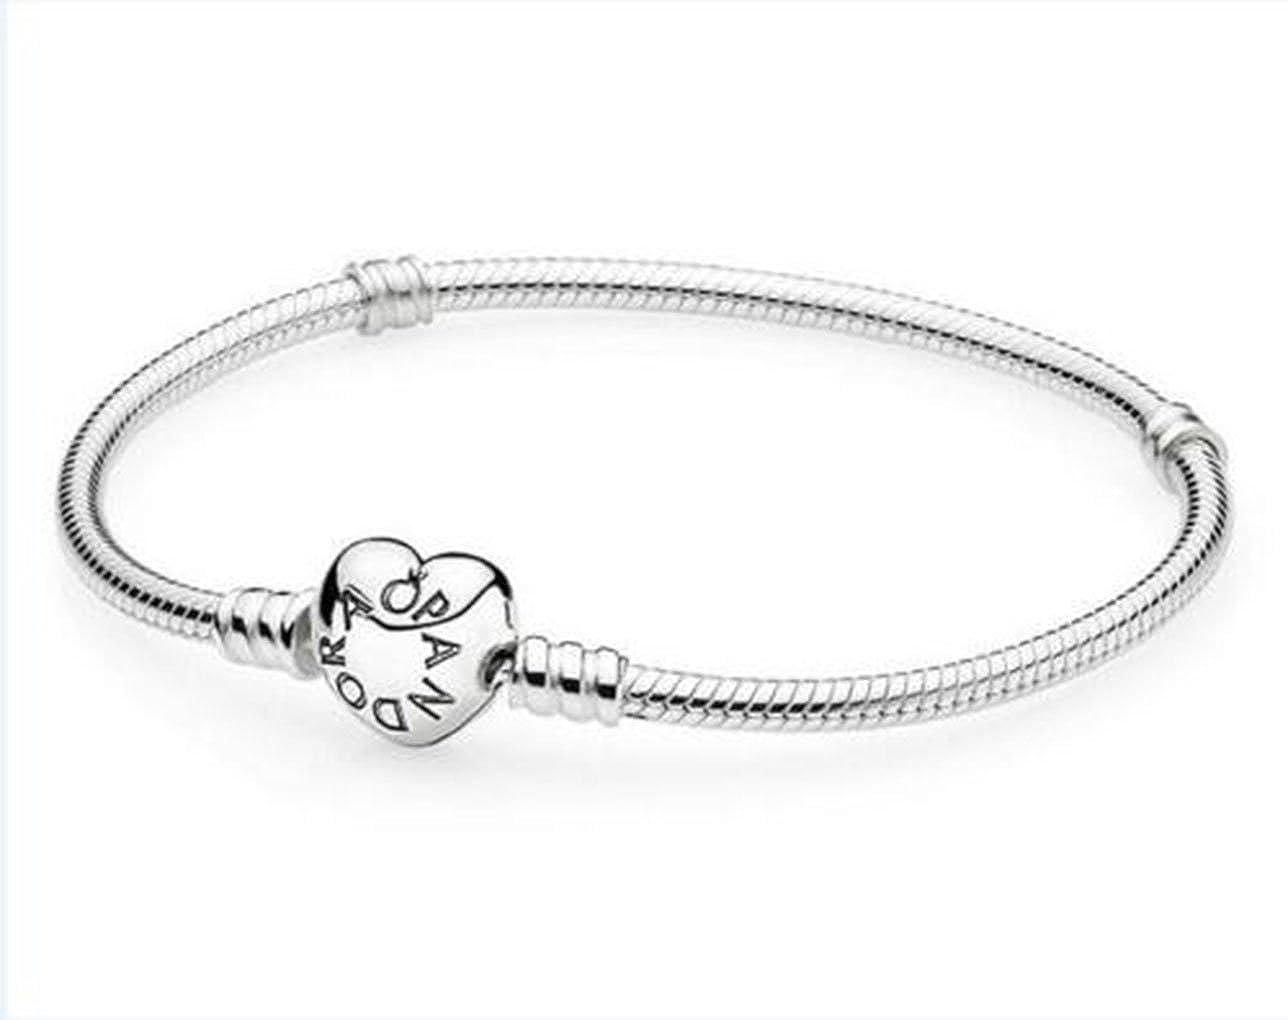 Lily-Li Fashion Heart-Shaped Popular Small P Heart-Shaped Button Adult Childrens Bracelet Heart Heart Button Silver Plated DIY Basic Snake Bone Bracelet